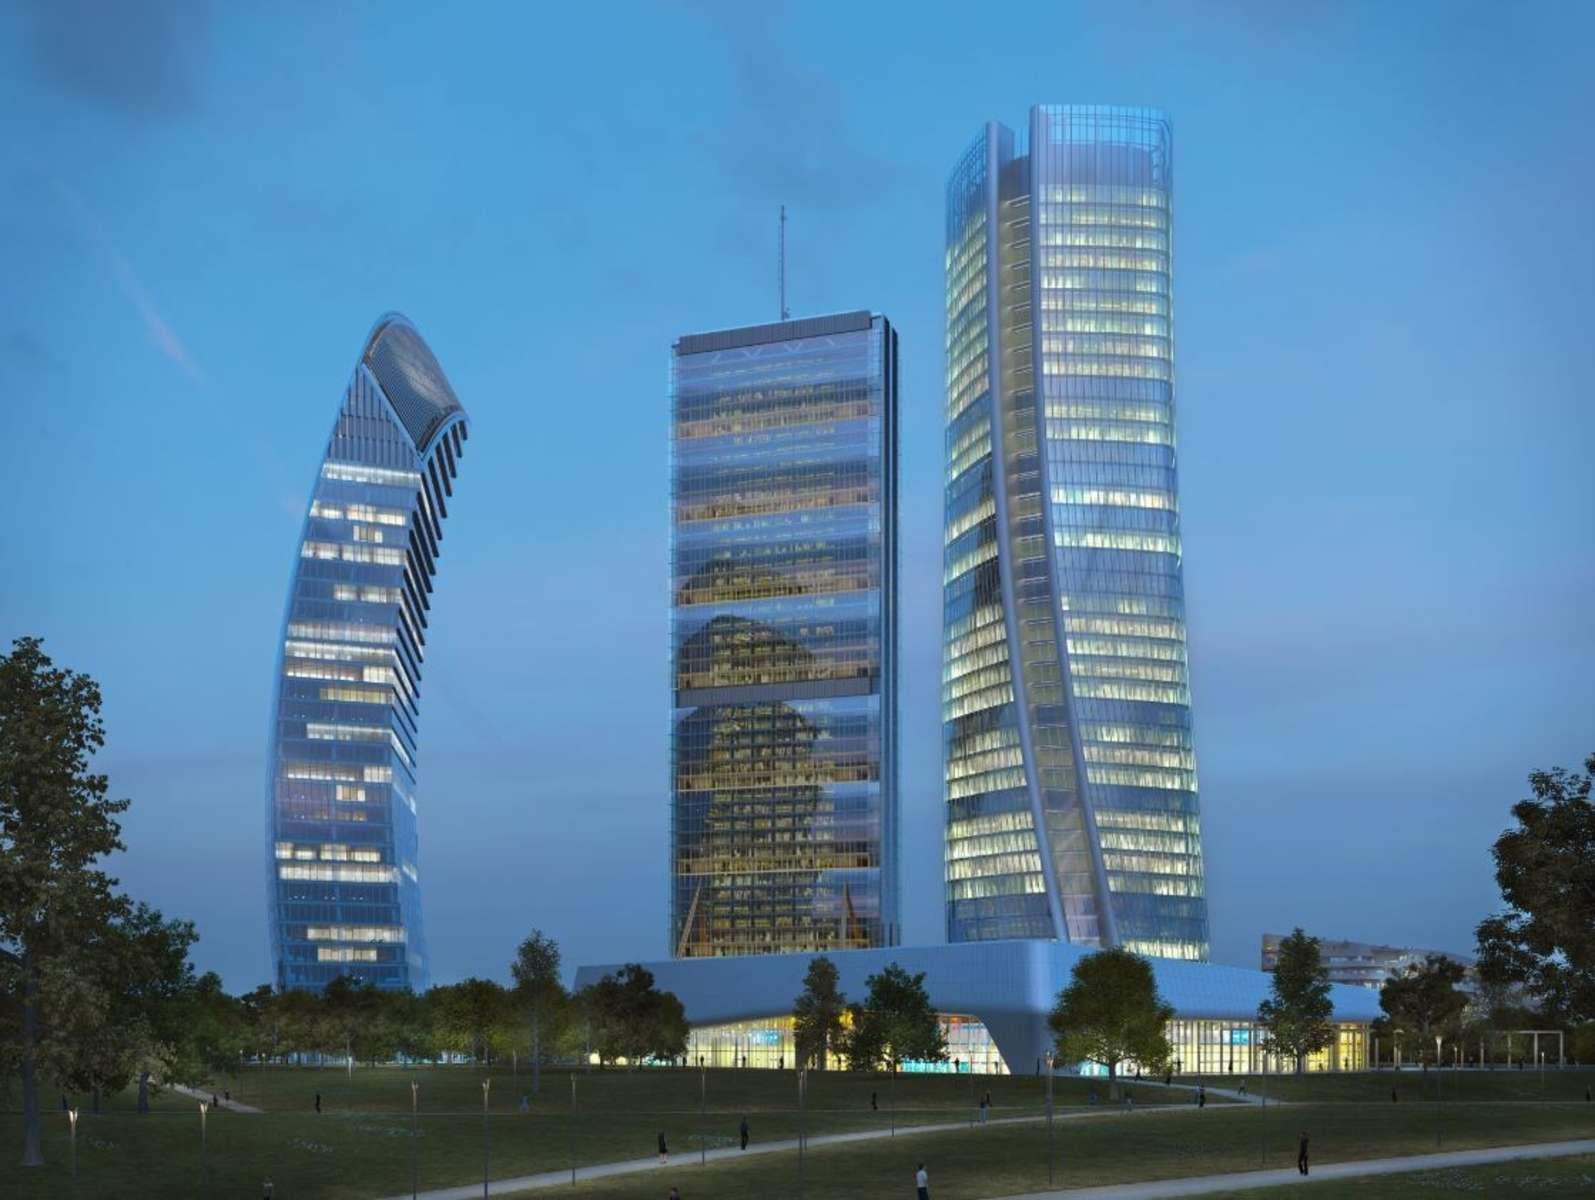 Torre libeskind uffici immobili per in locazione jll for Uffici a milano